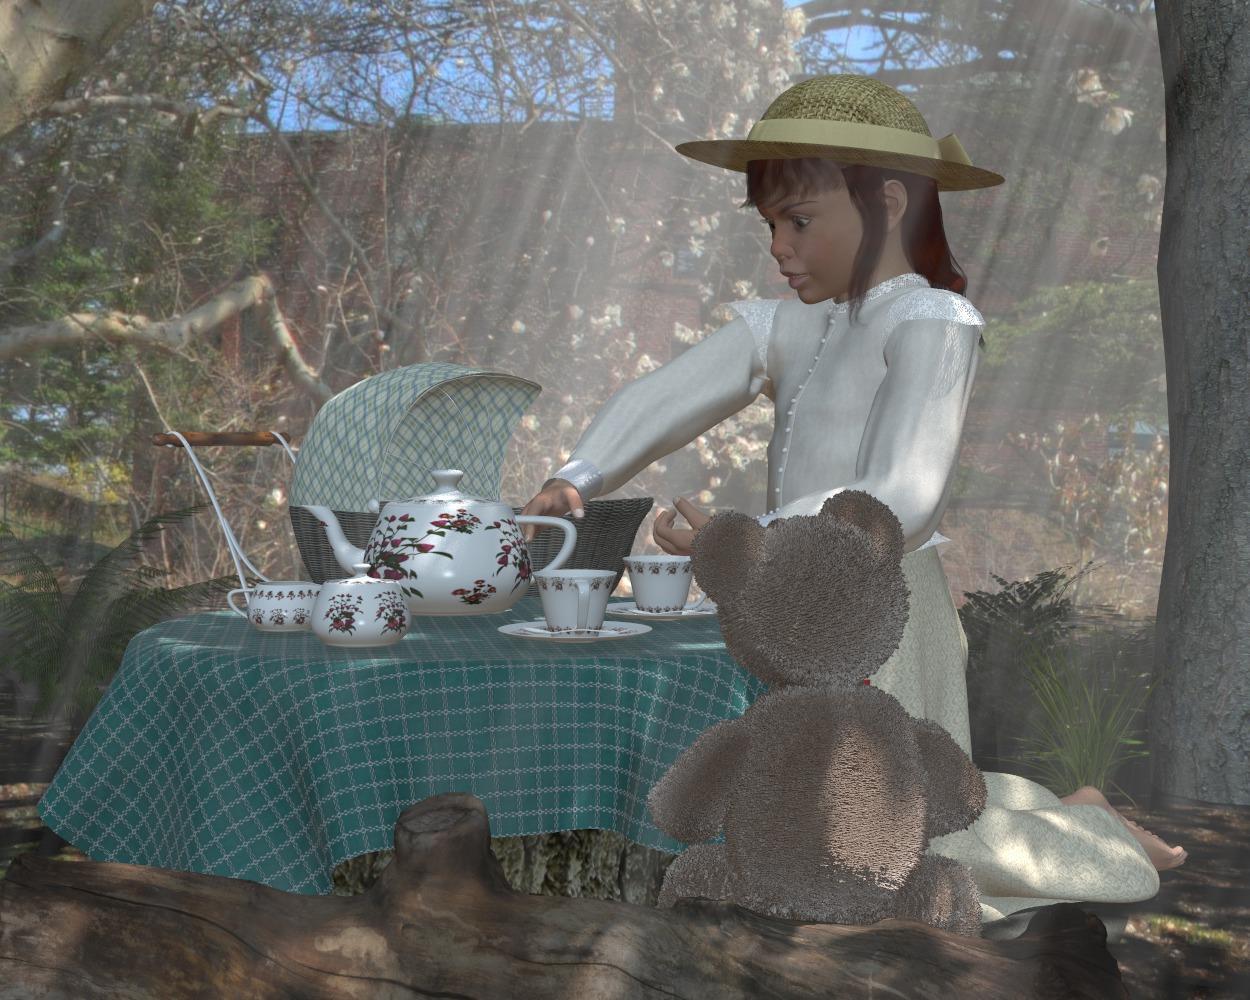 picnicinthewoods